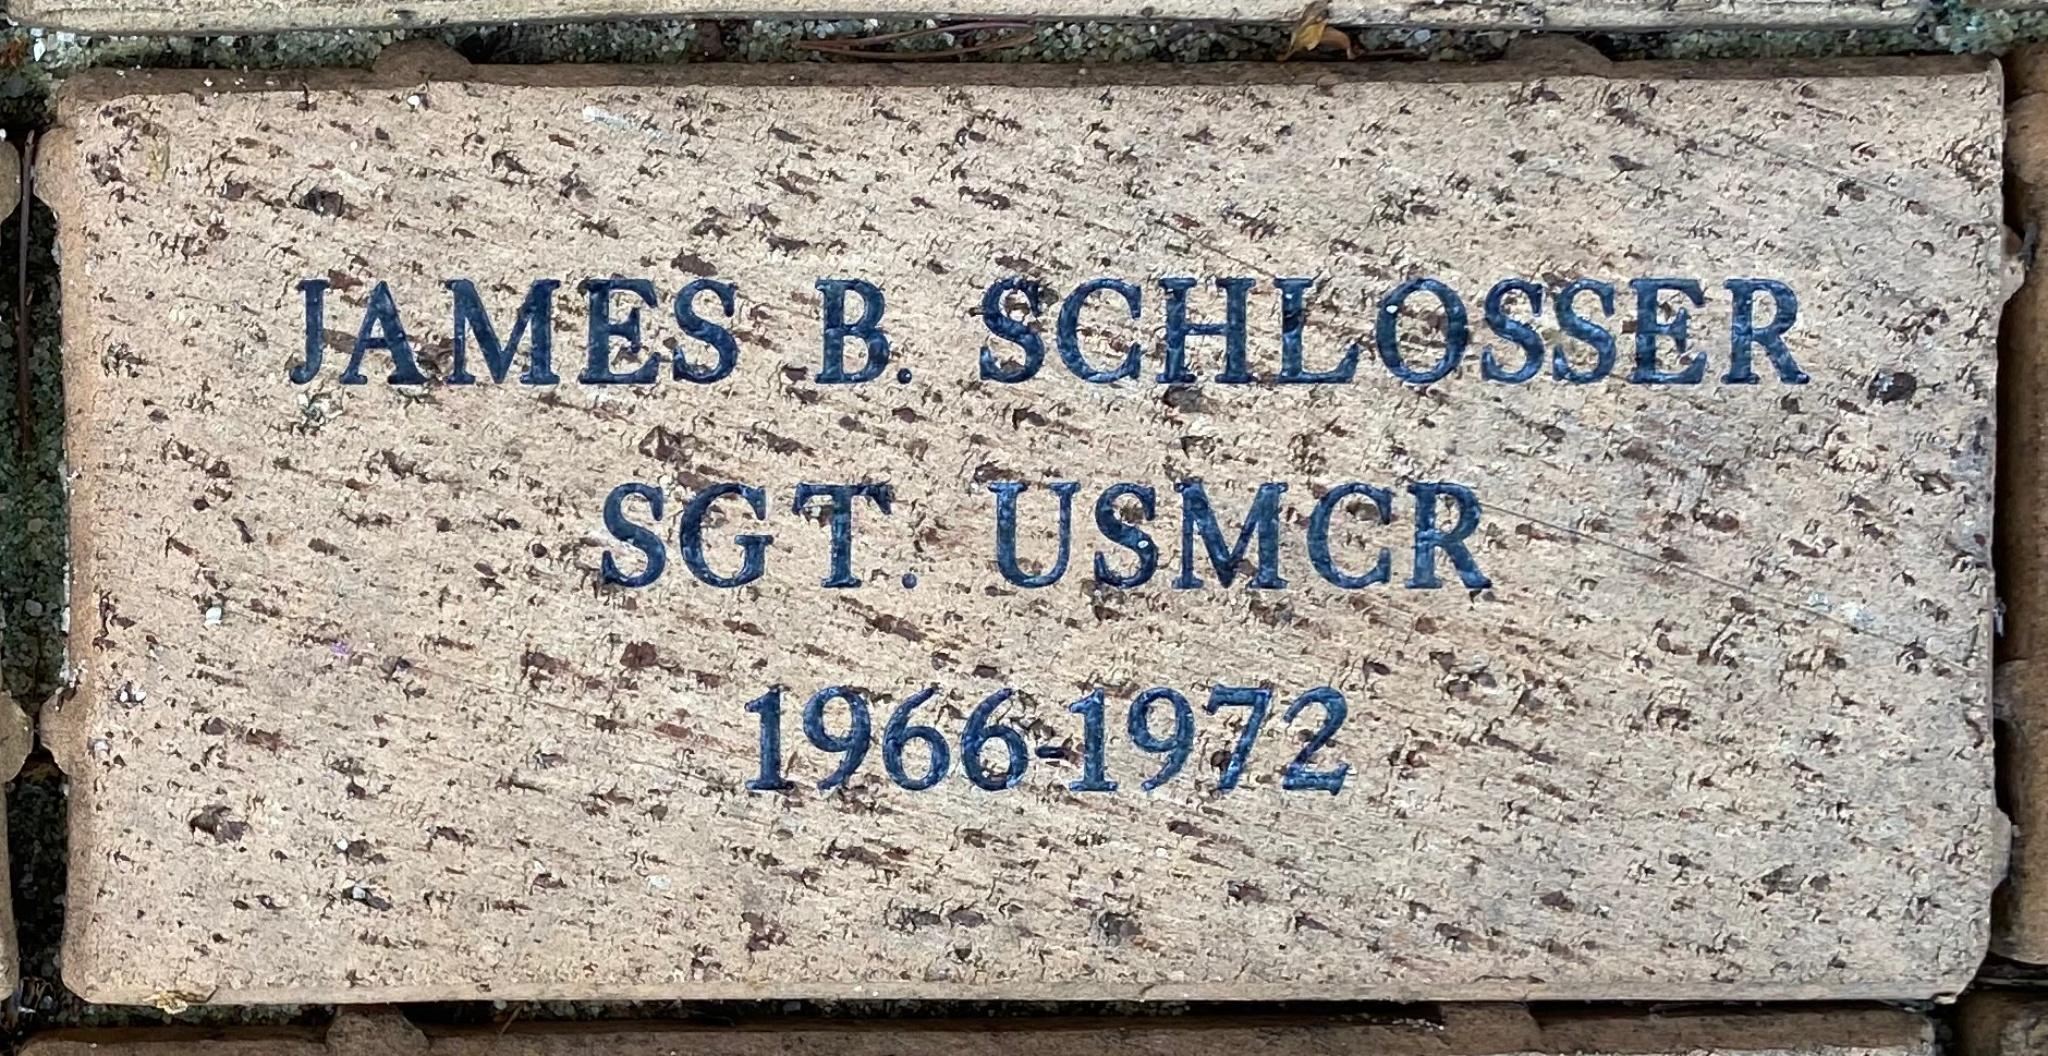 JAMES B. SCHLOSSER SGT. USMCR 1966-1972